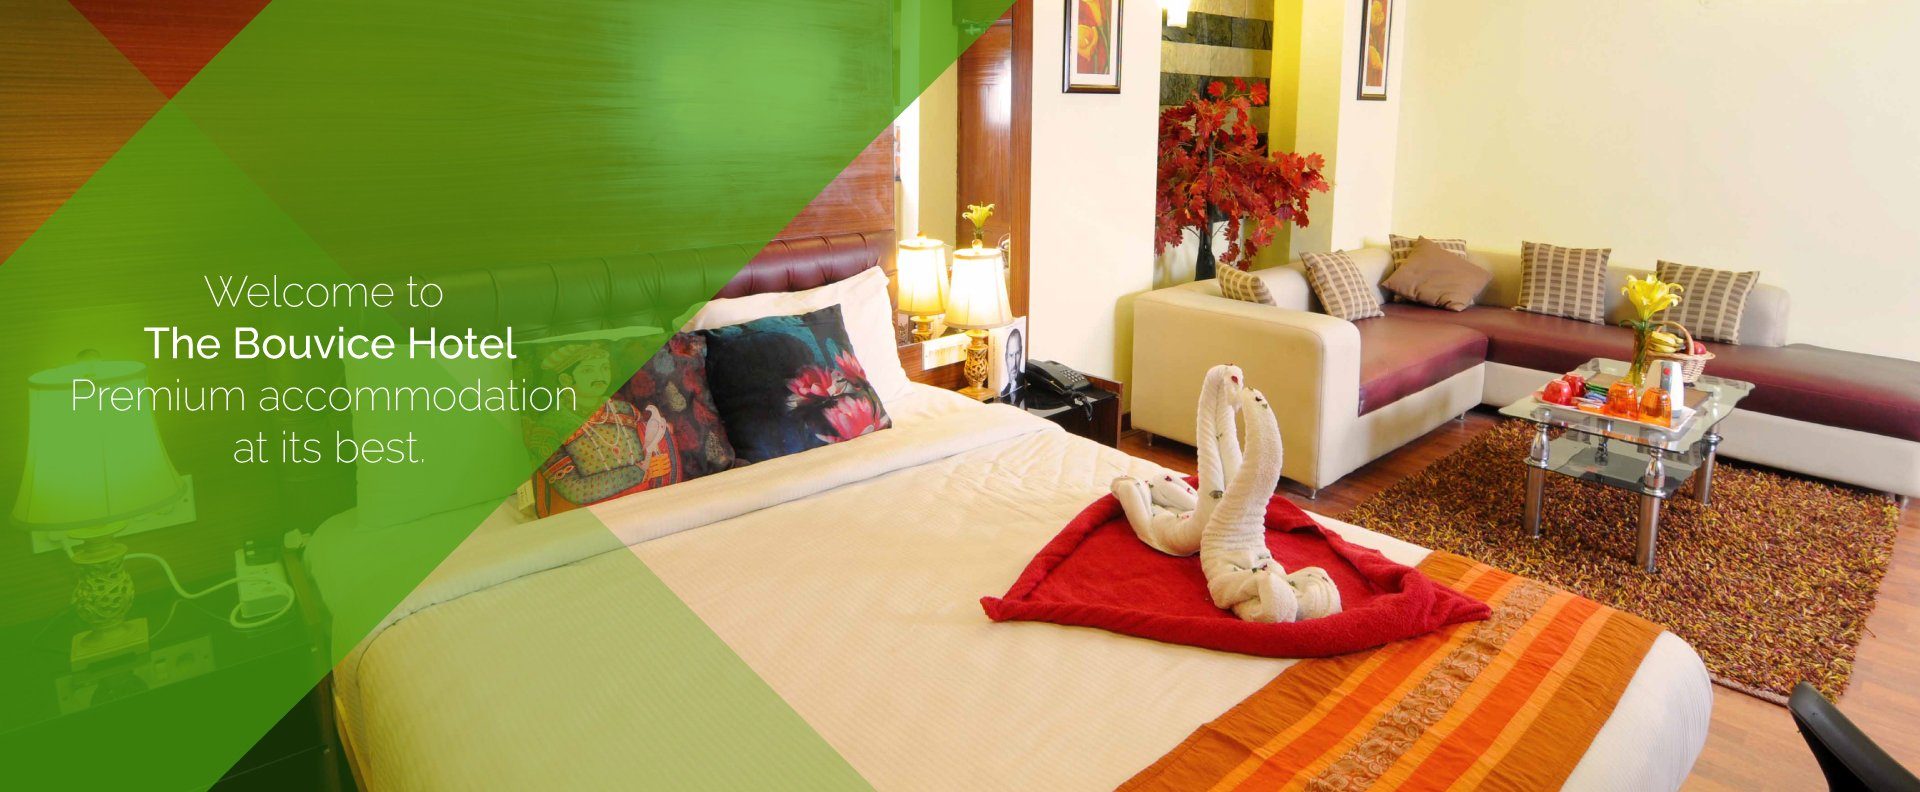 The bouvice best hotels in koramangala bangalore image description gumiabroncs Images